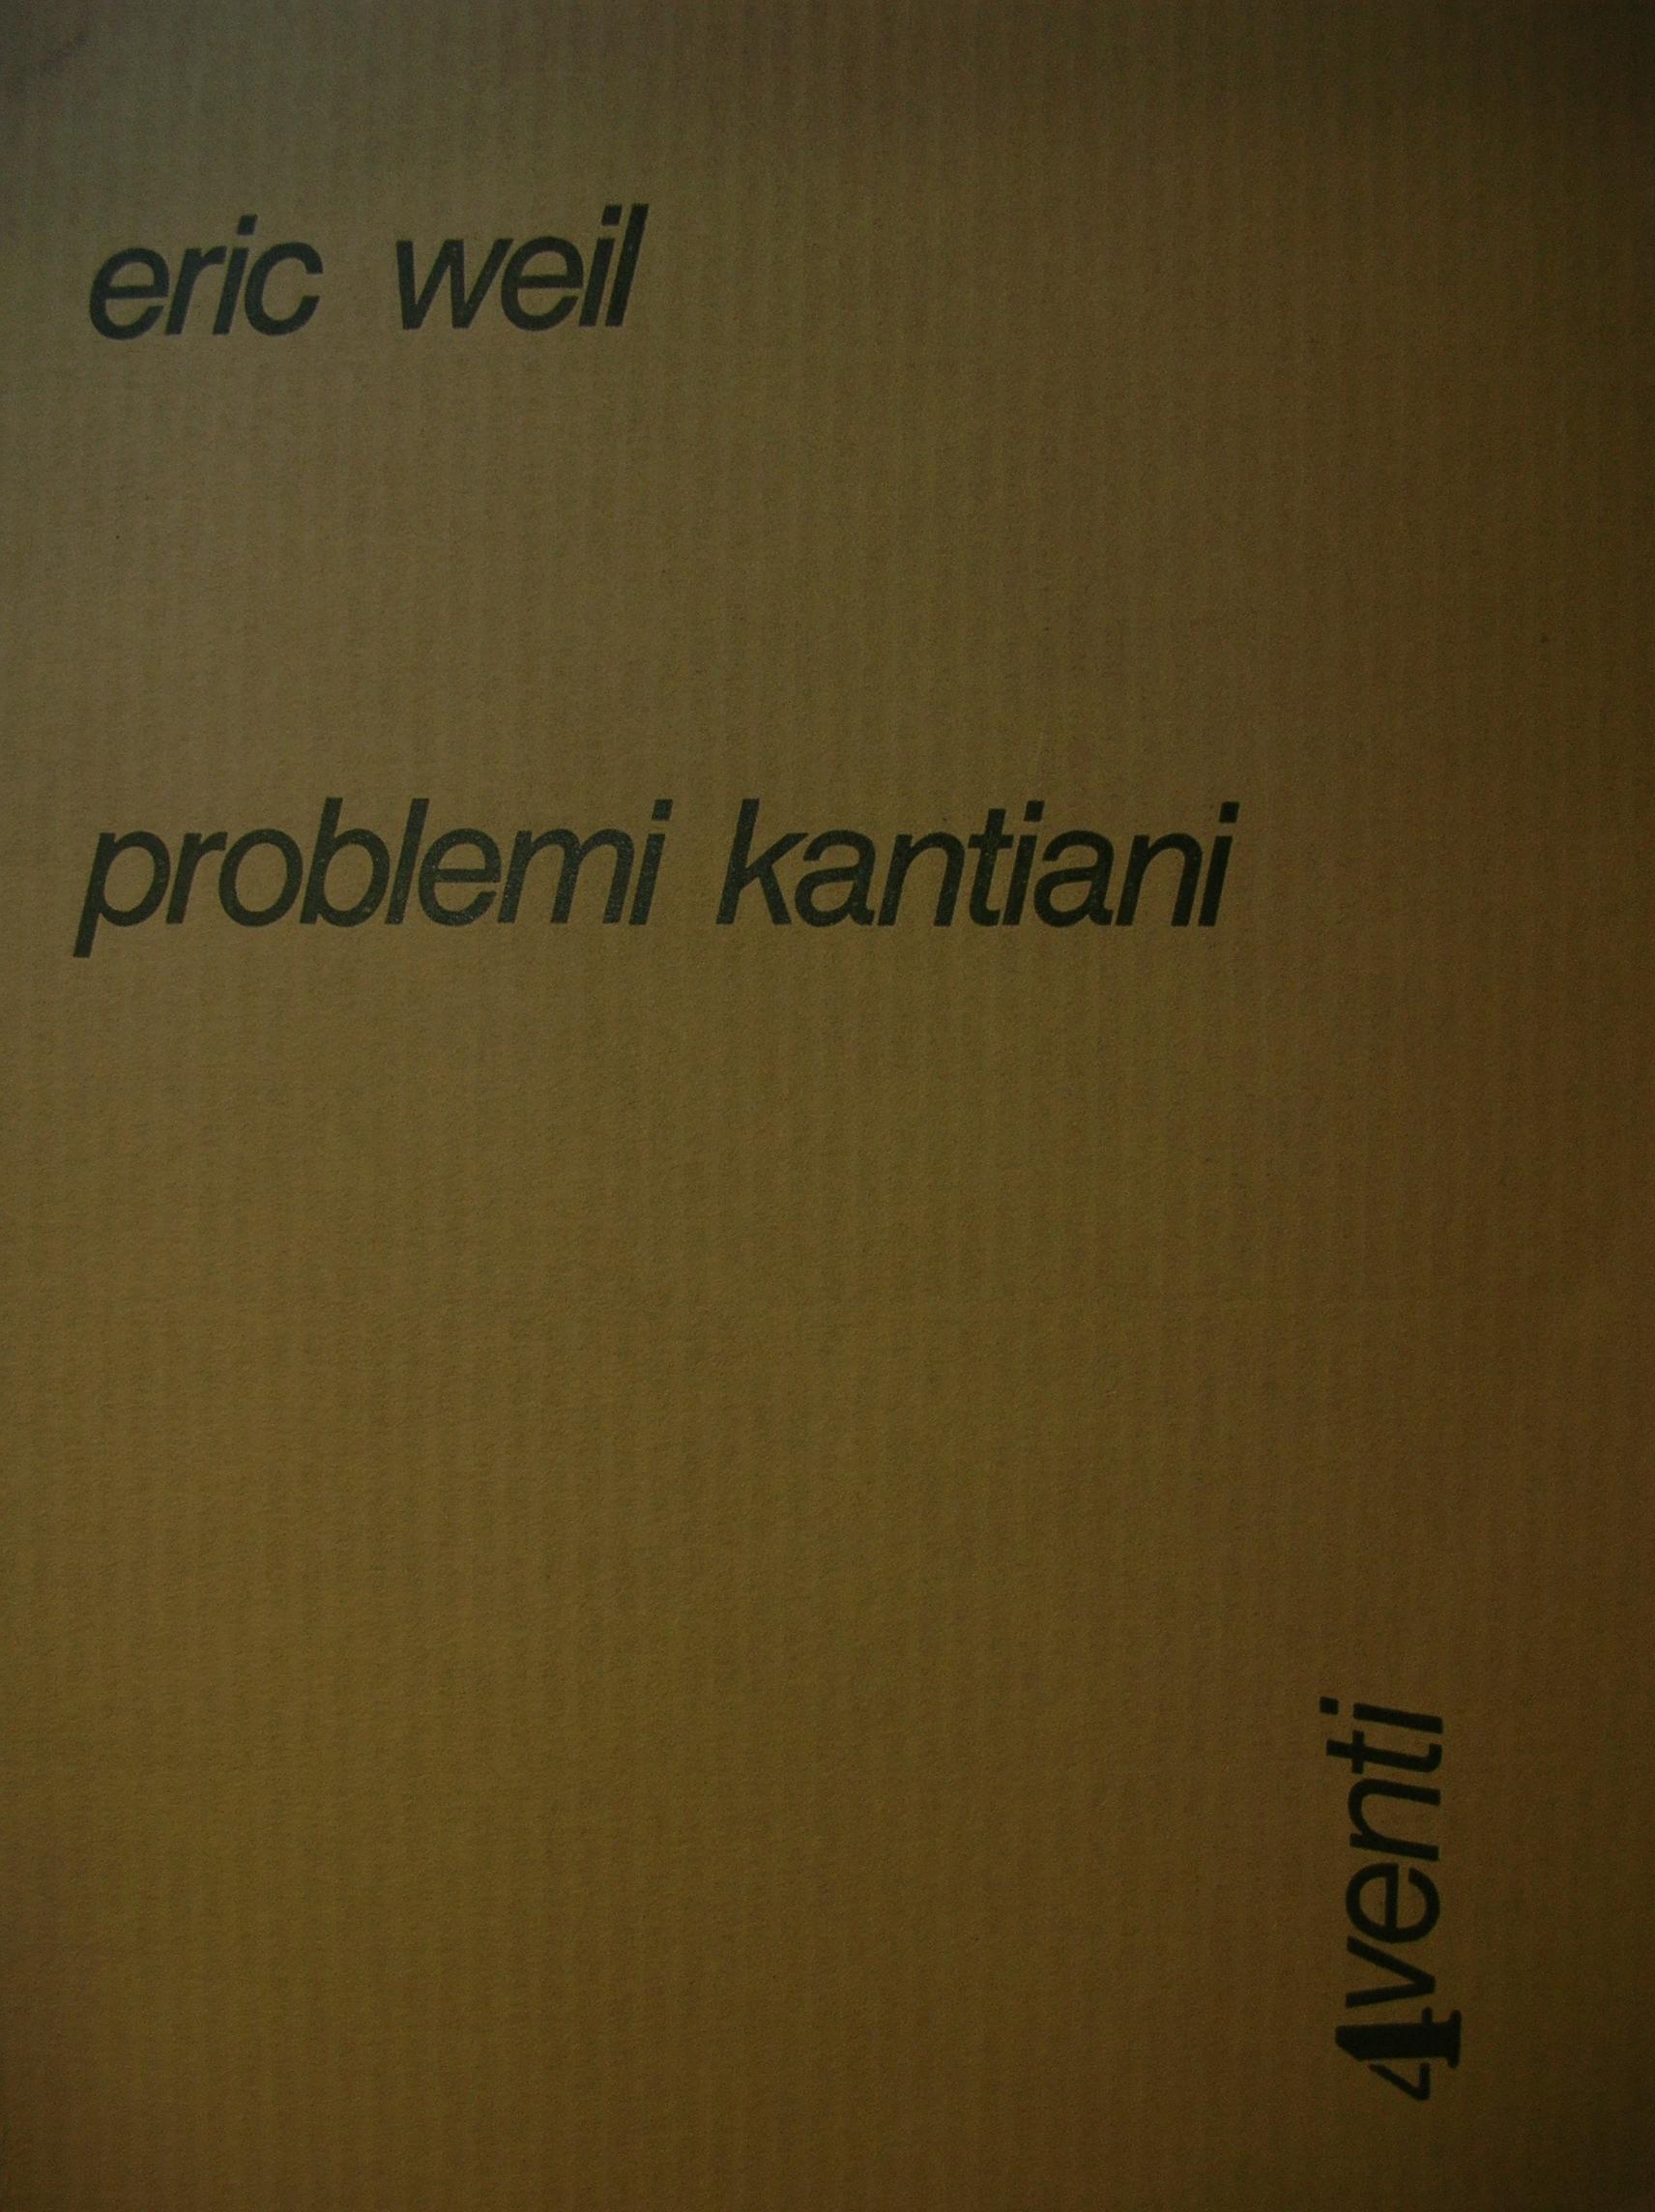 Problemi kantiani